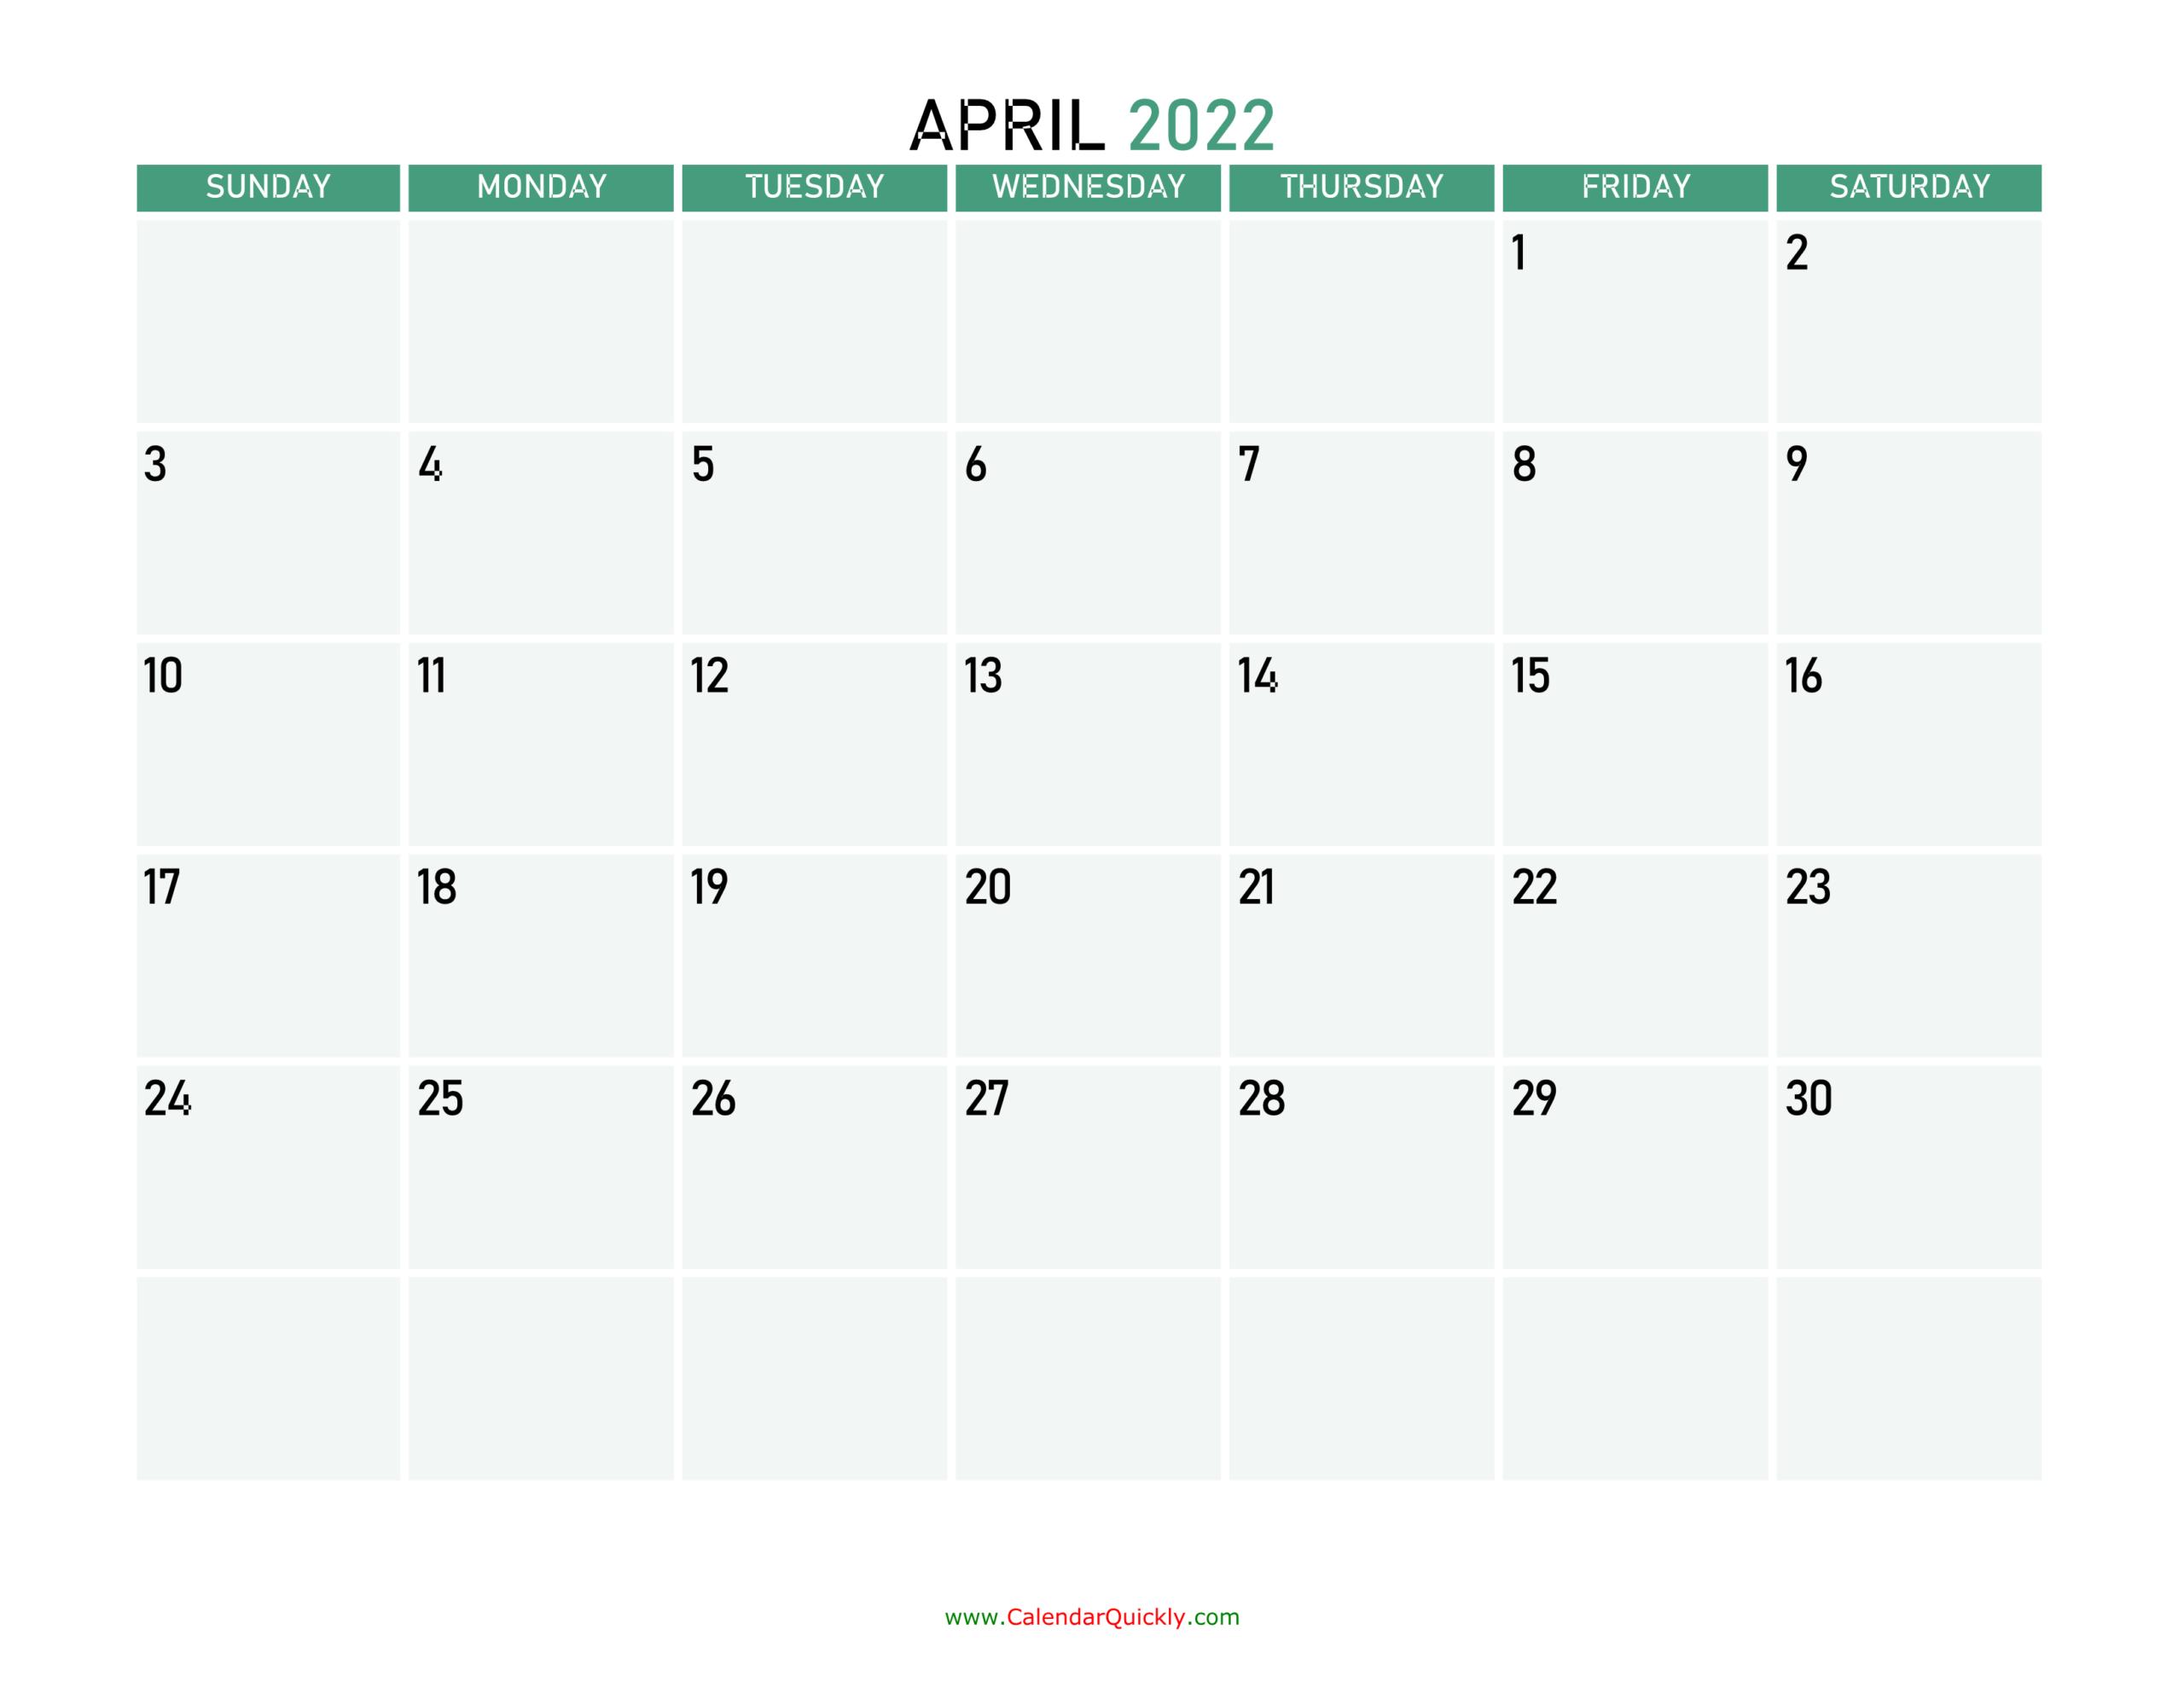 Calendar Quickly